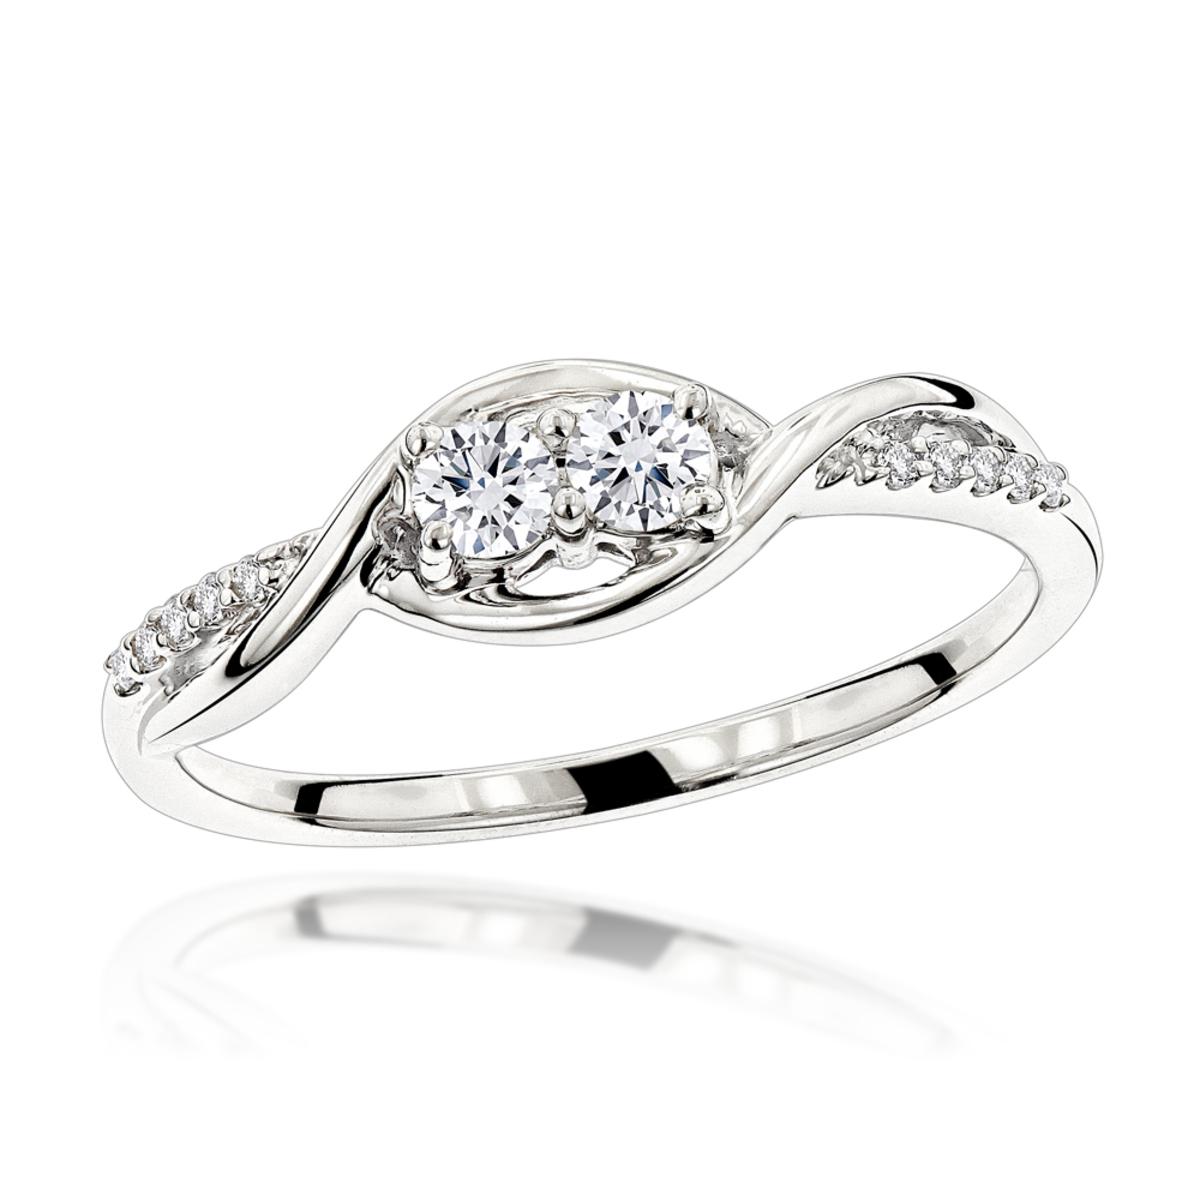 14K Gold 2 Stone Infinite Love and Friendship Diamond Ring for Women 0.25ct